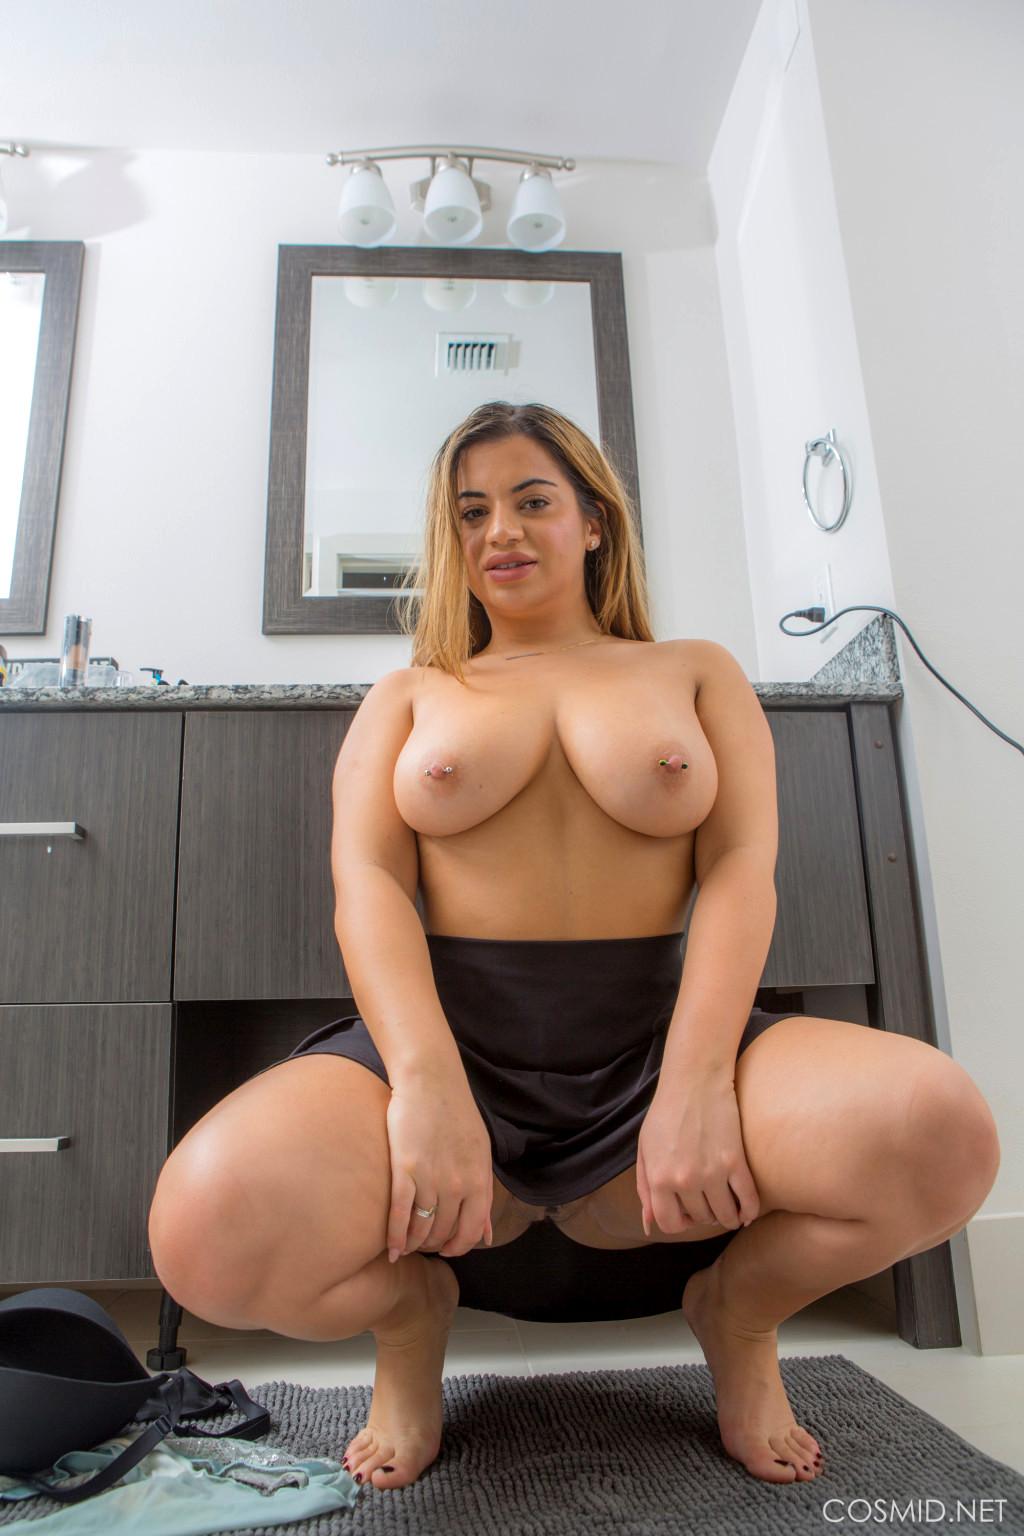 Babe Today Cosmid Lisa Martiz Instance Chubby Nudity -2460